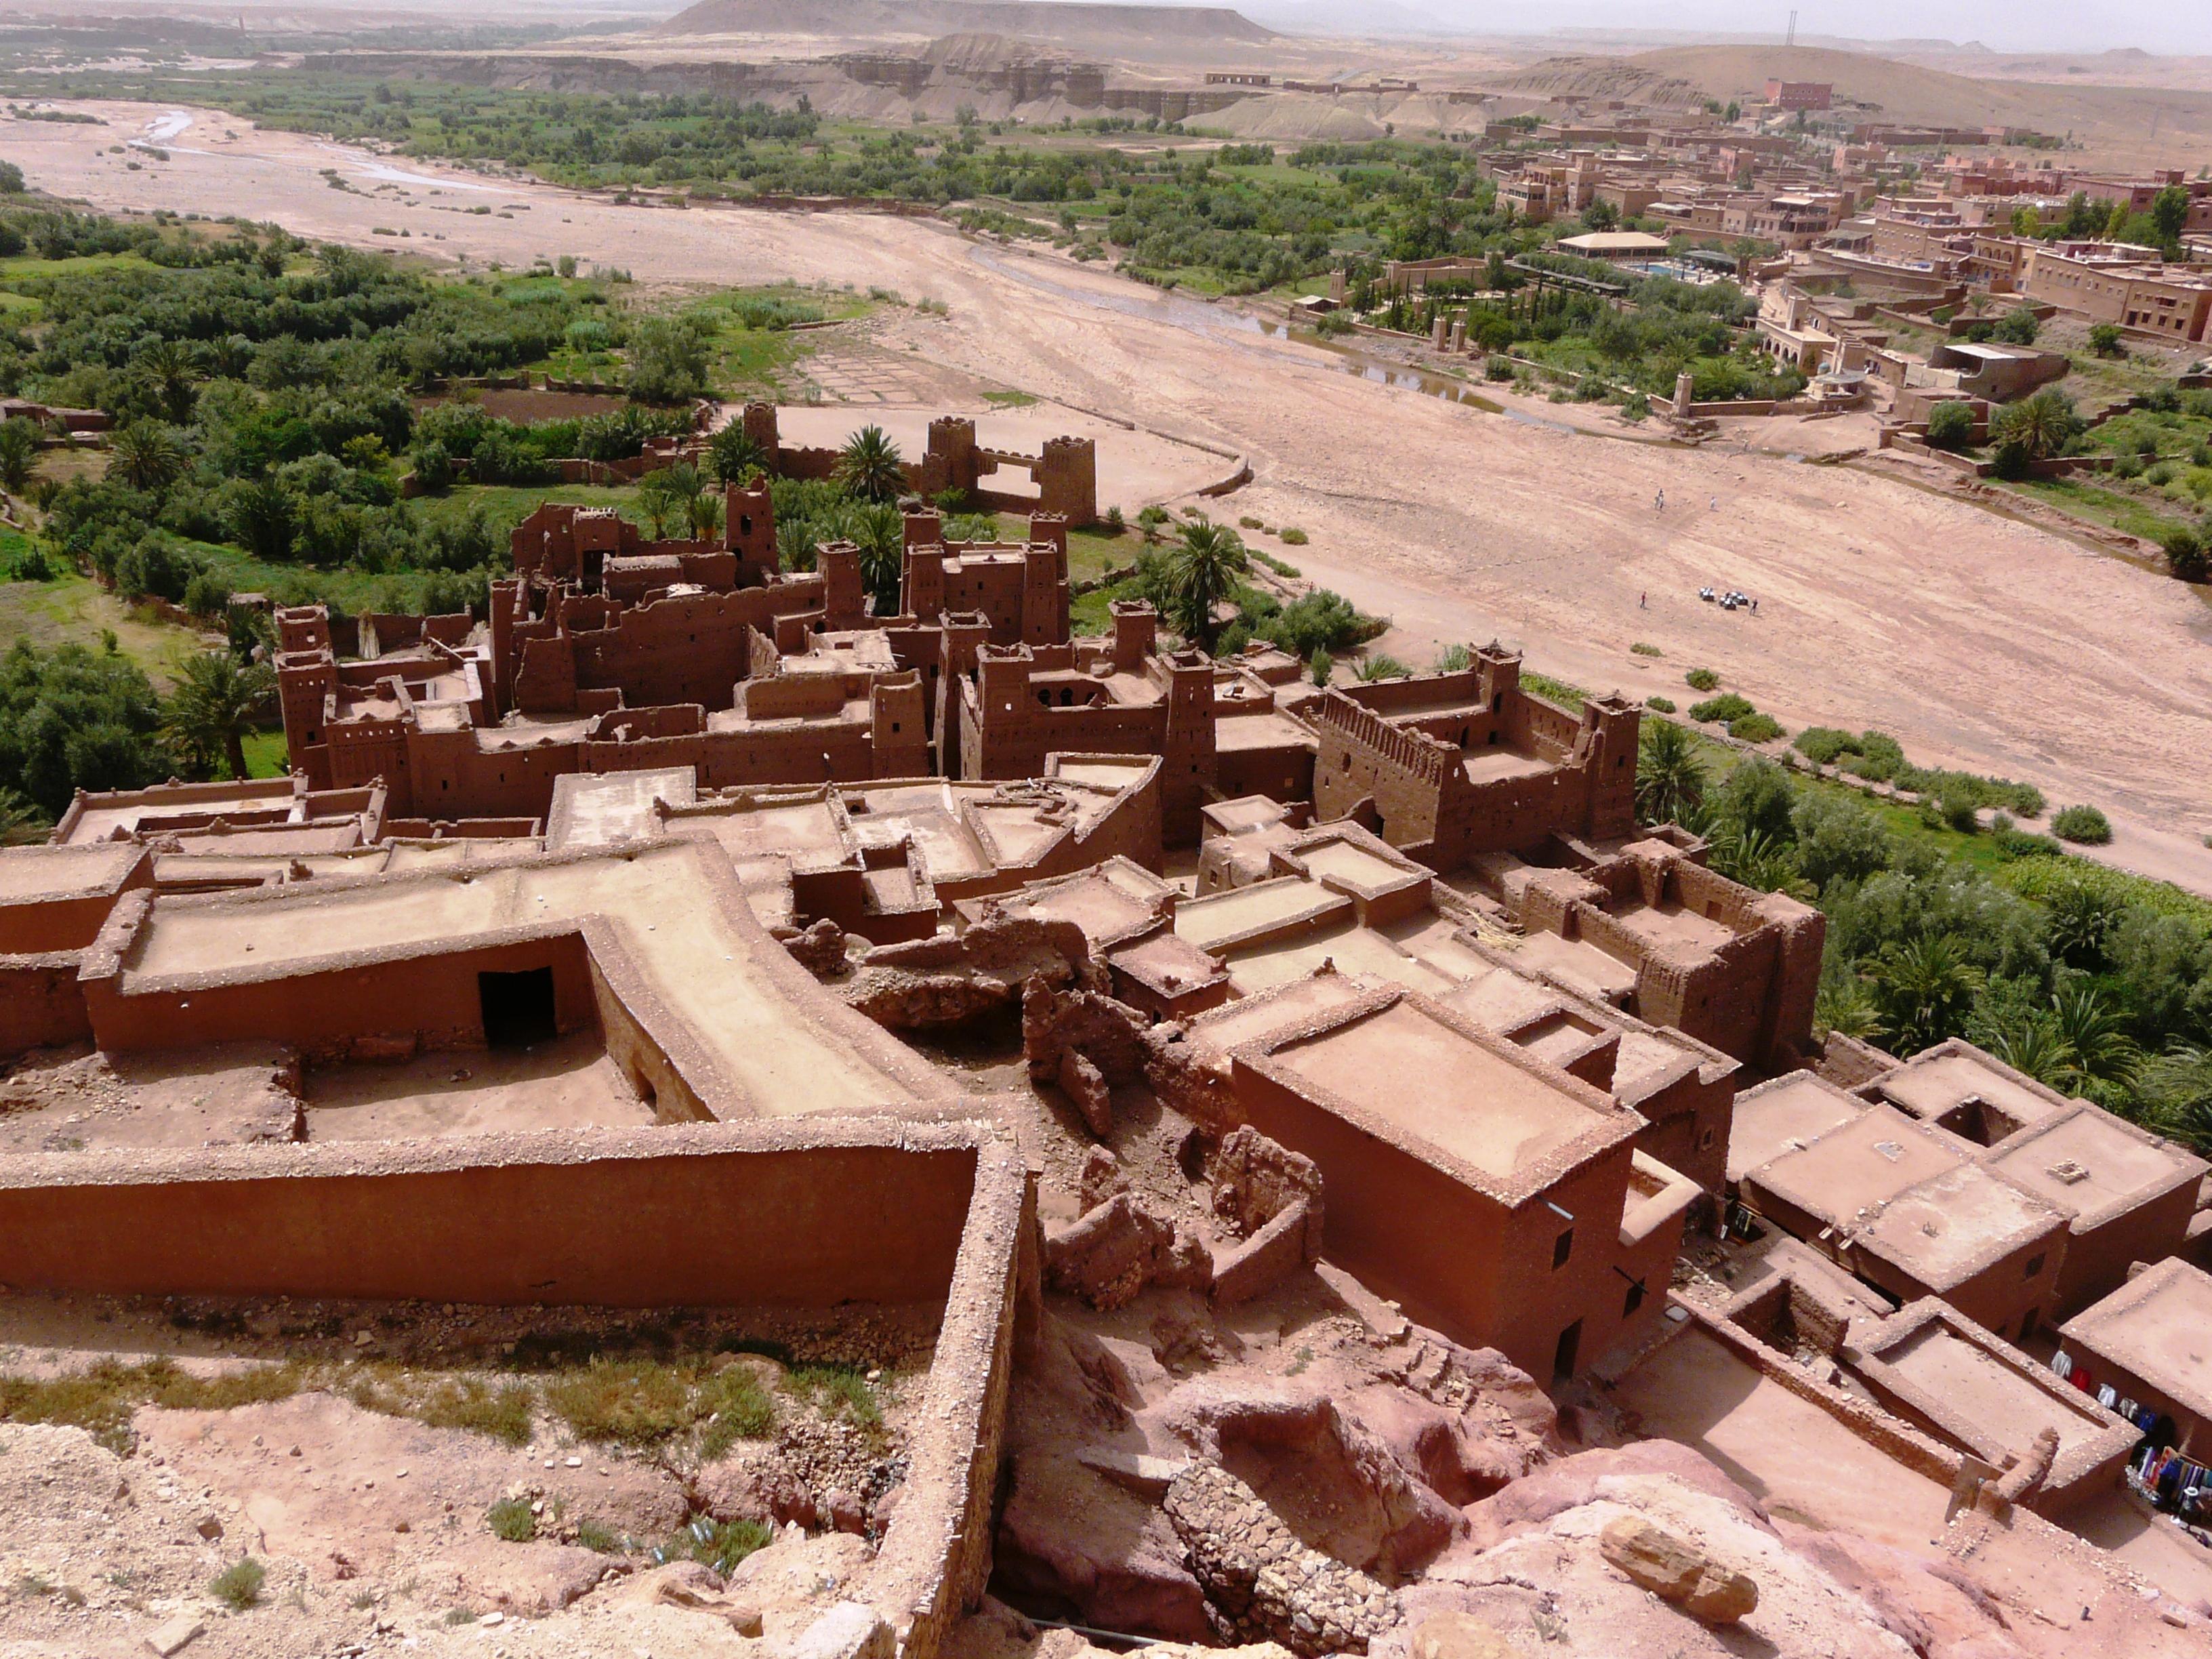 Kaskah-ait-ben-haddou-marruecos